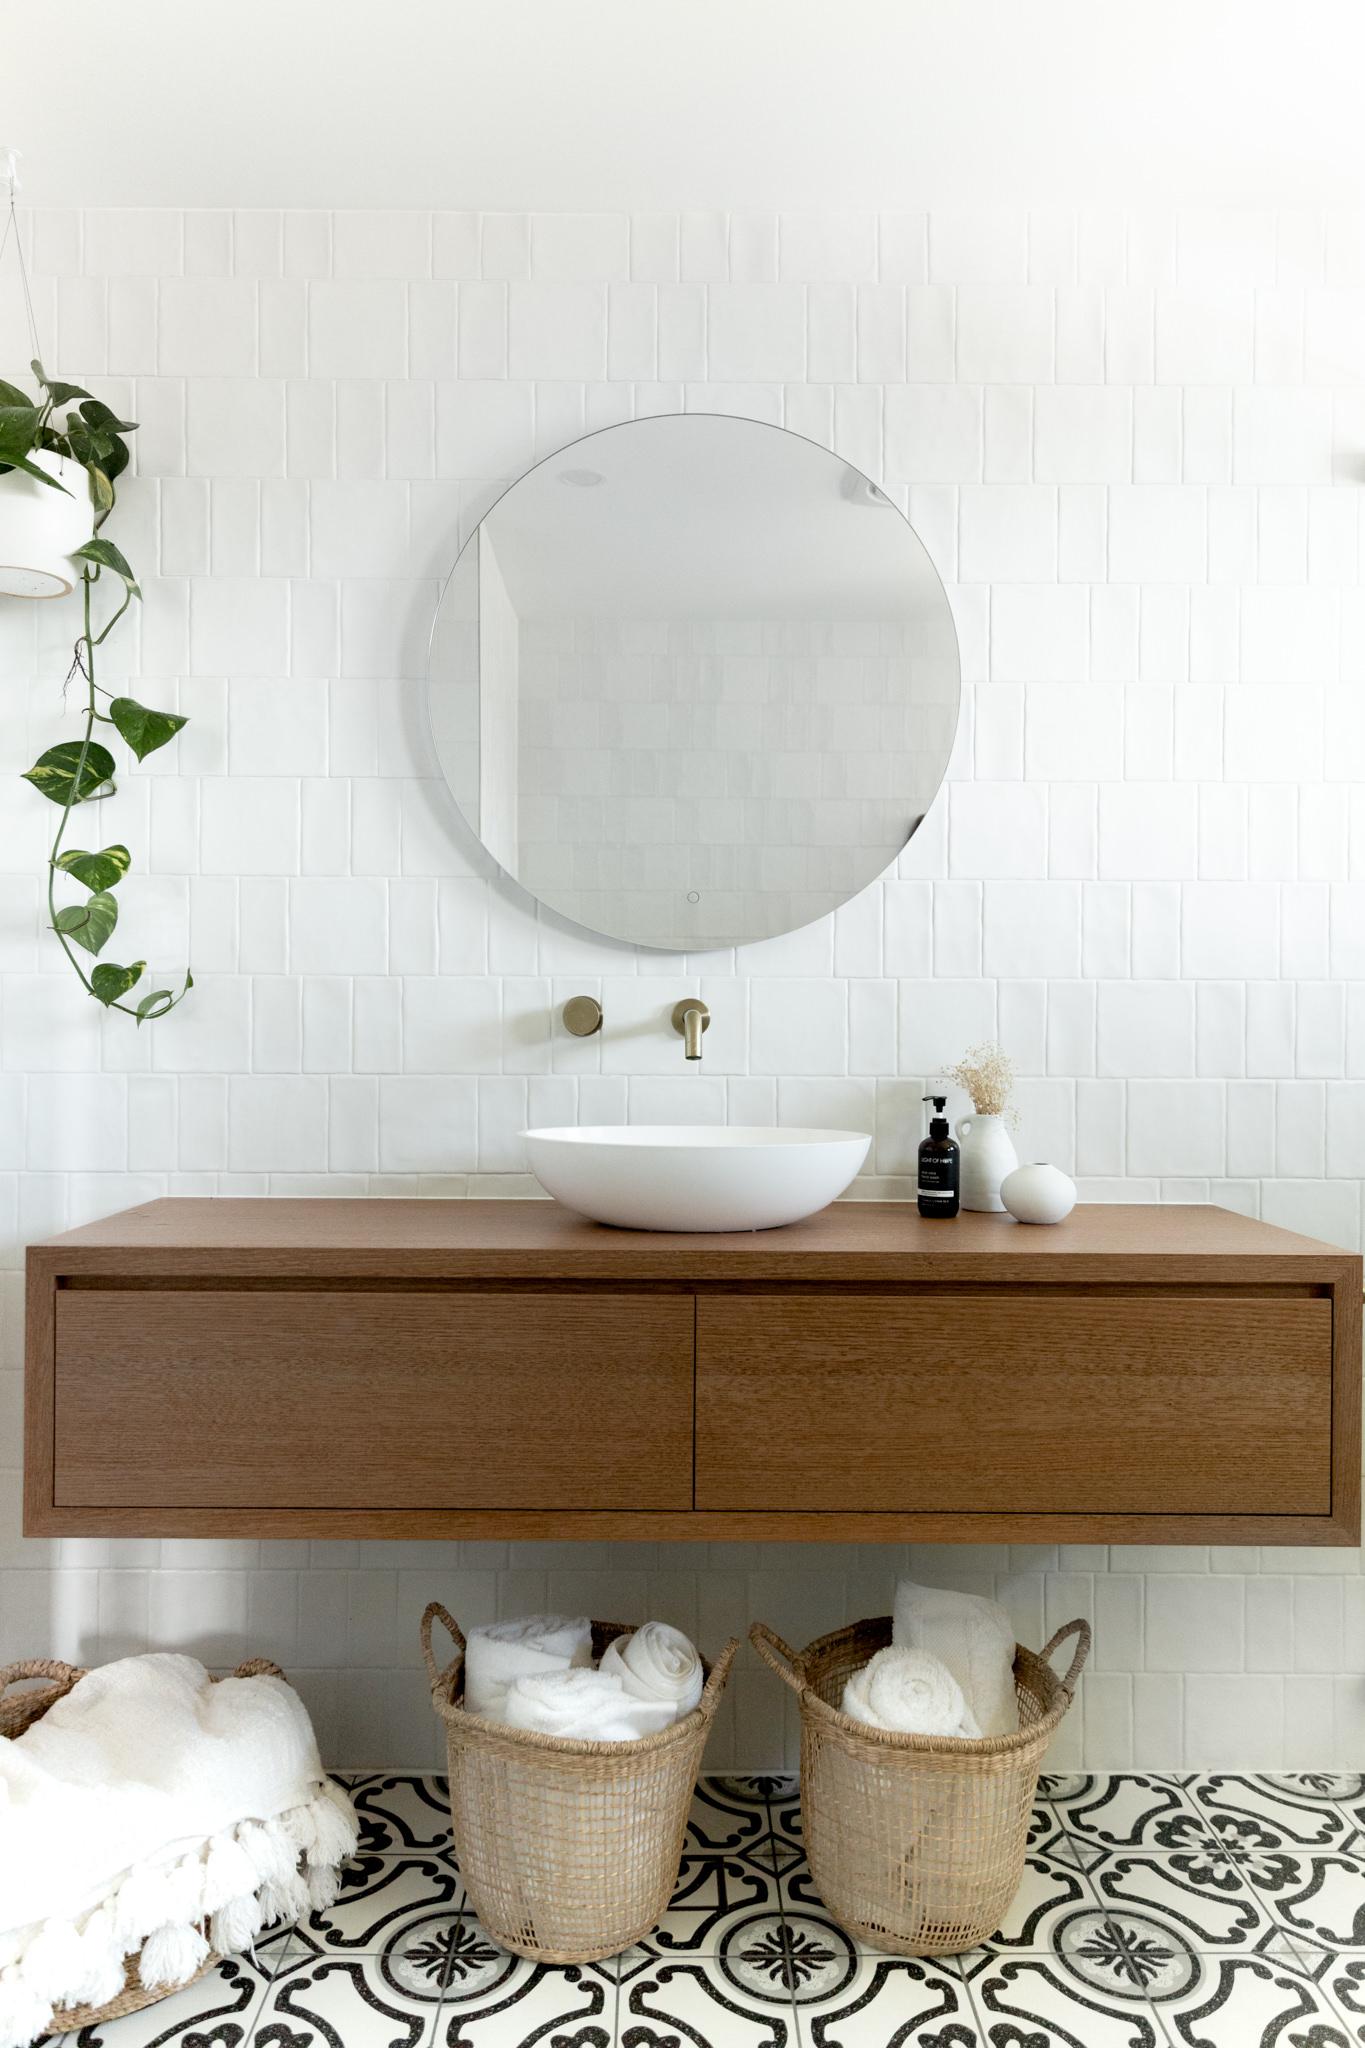 Bone + Blanc Bathroom Renovation - Handmade tiles